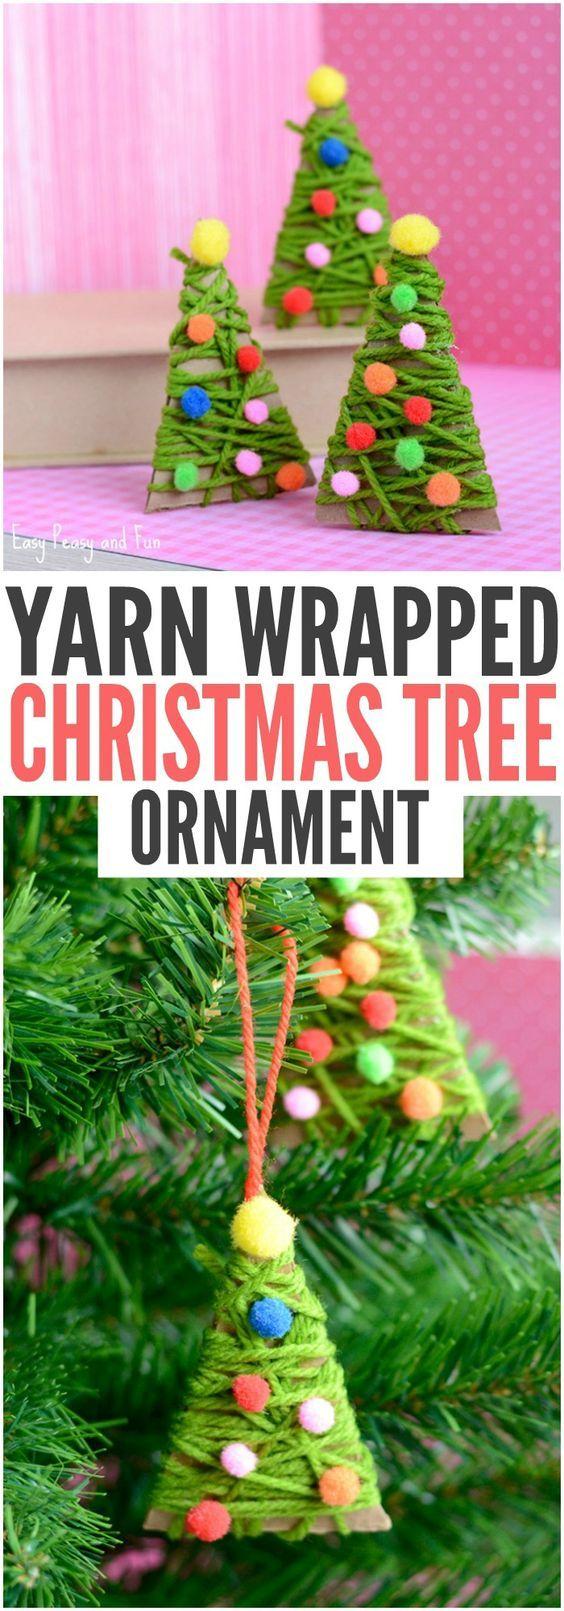 Yarn Wrapped Christmas Tree Ornaments